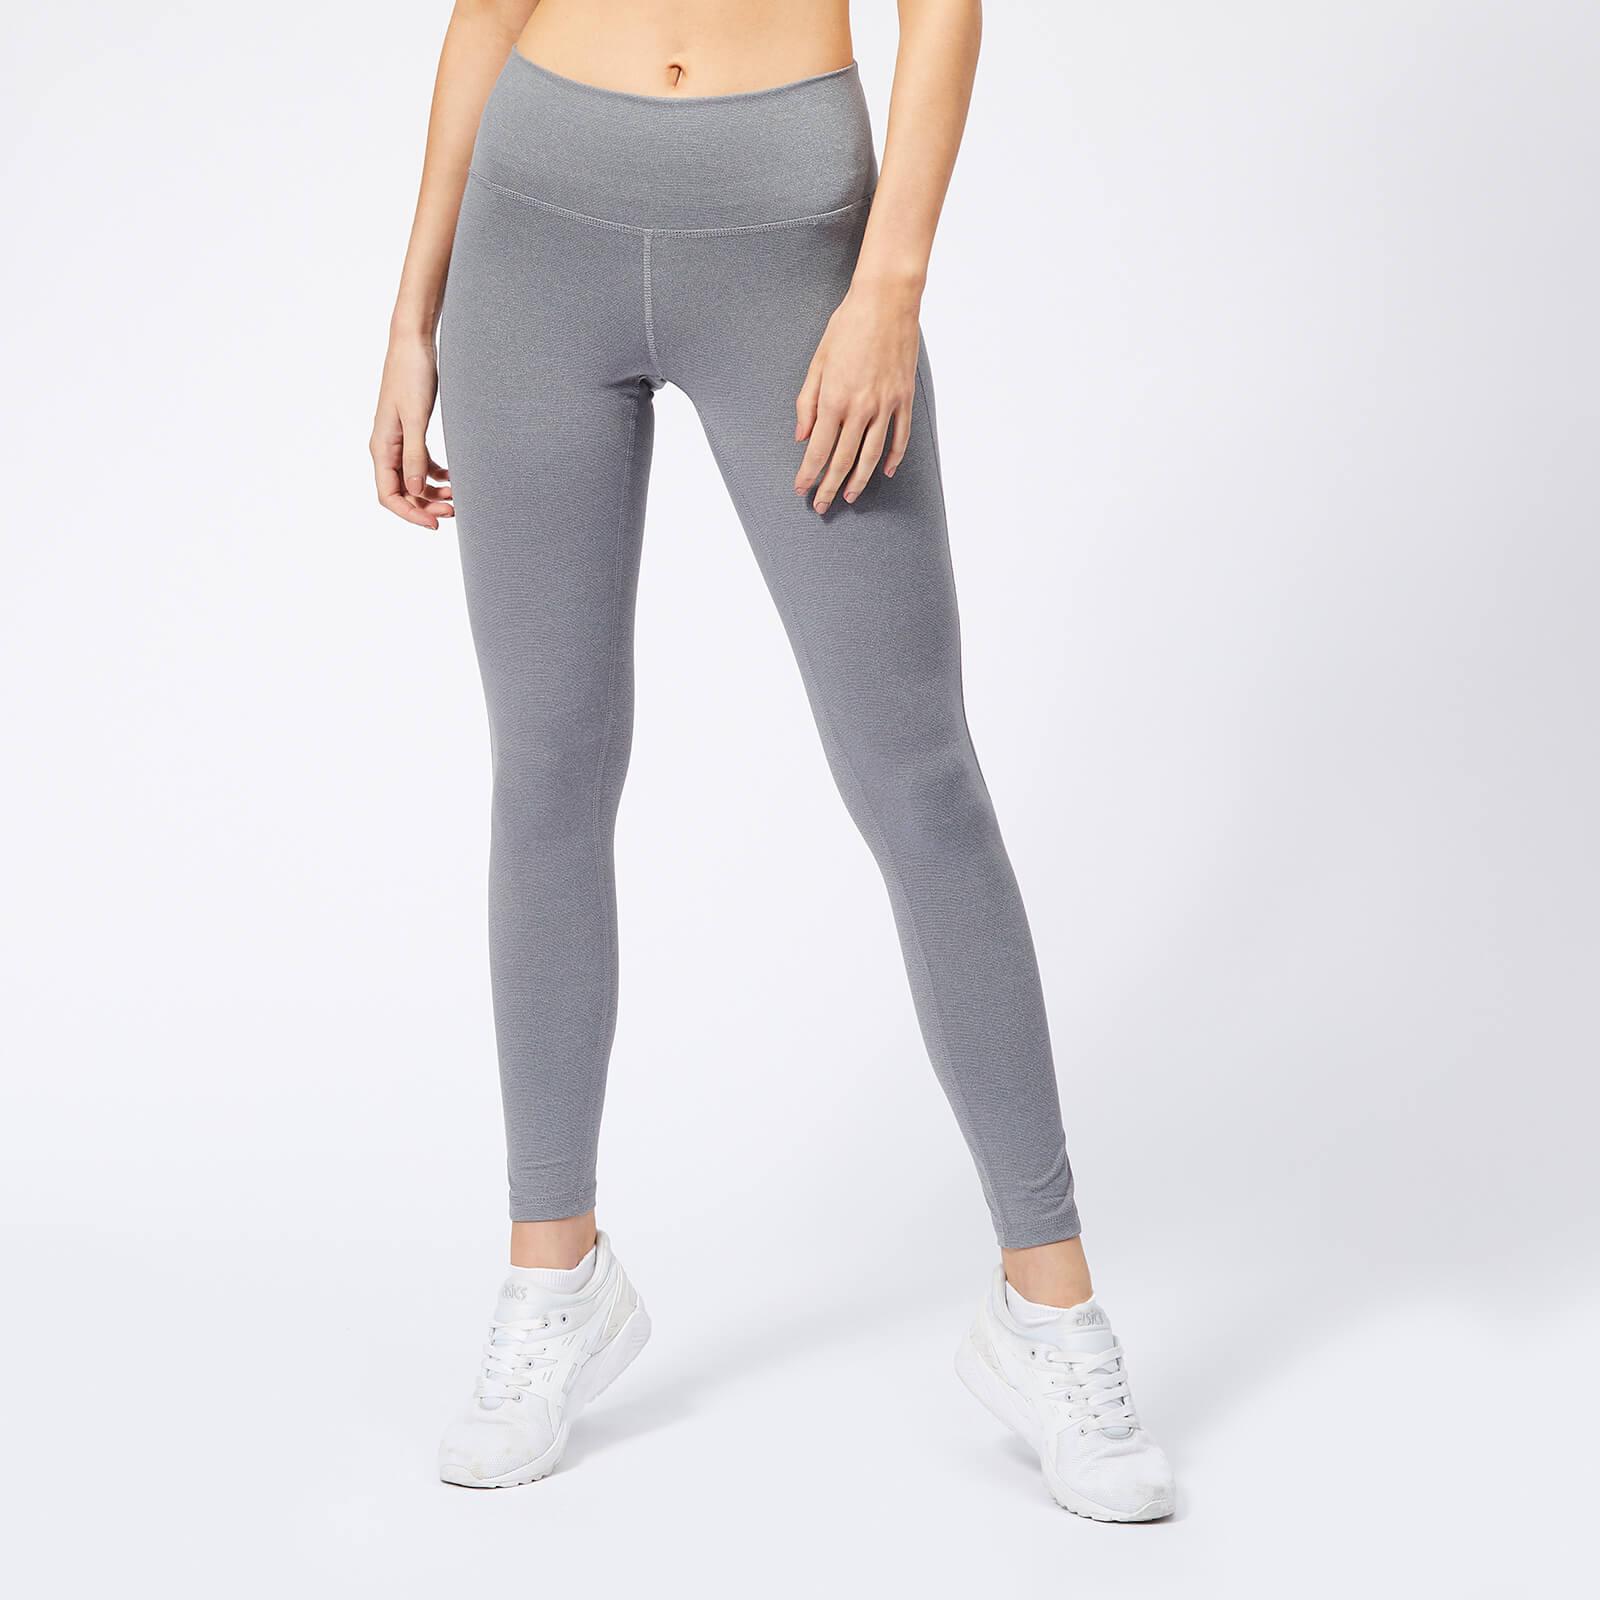 da18468164c adidas Women s Believe This High Rise Tights - Grey Sports   Leisure ...